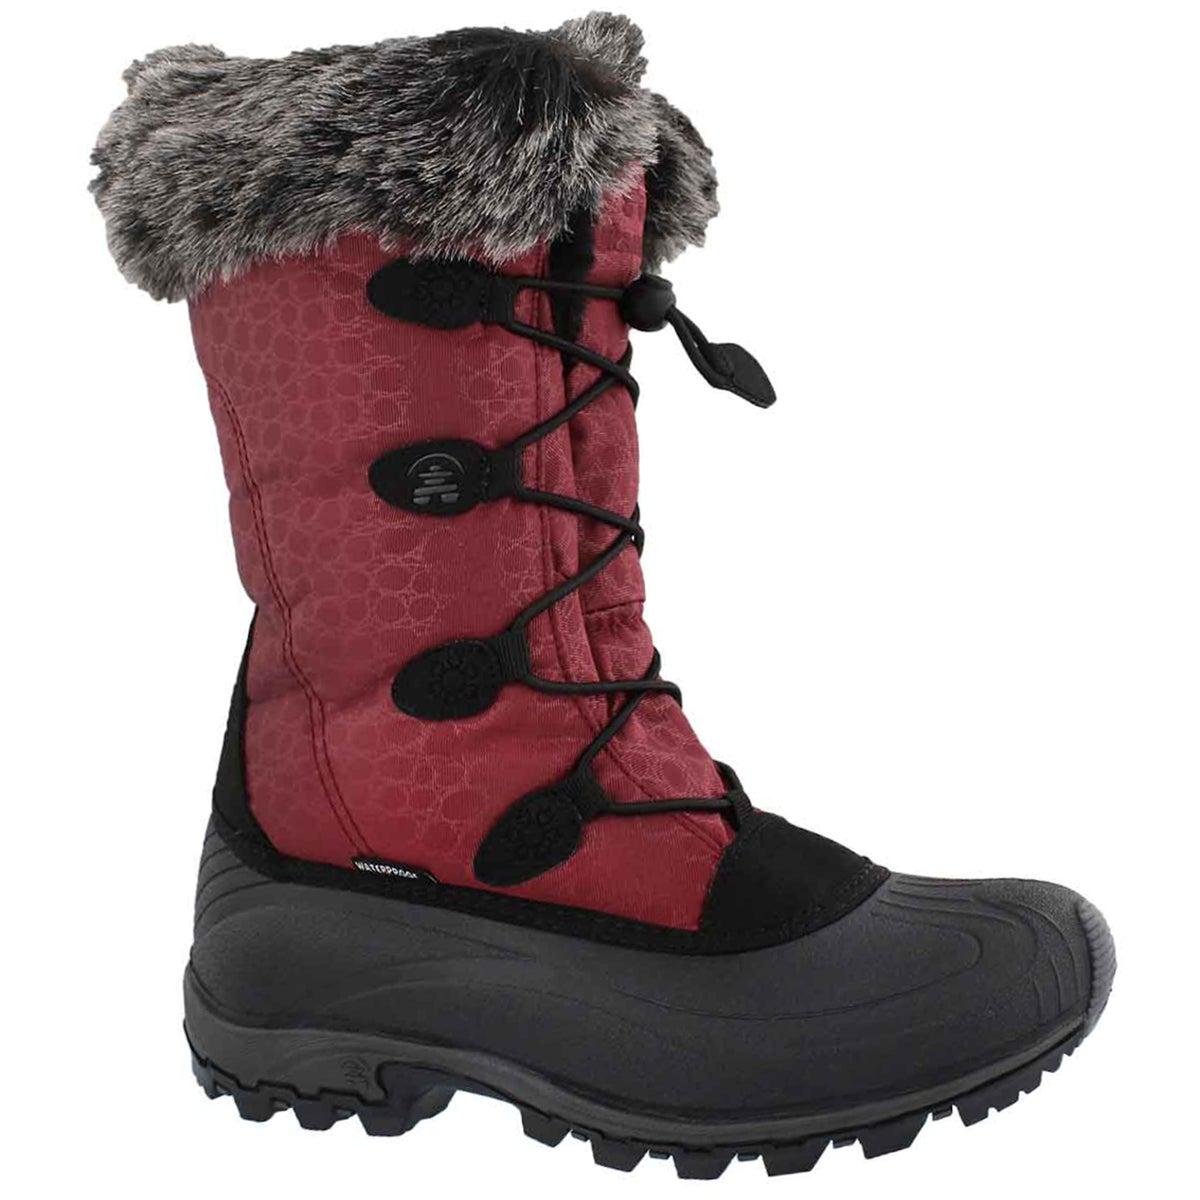 Women's MOMENTUM burgundy winter boots